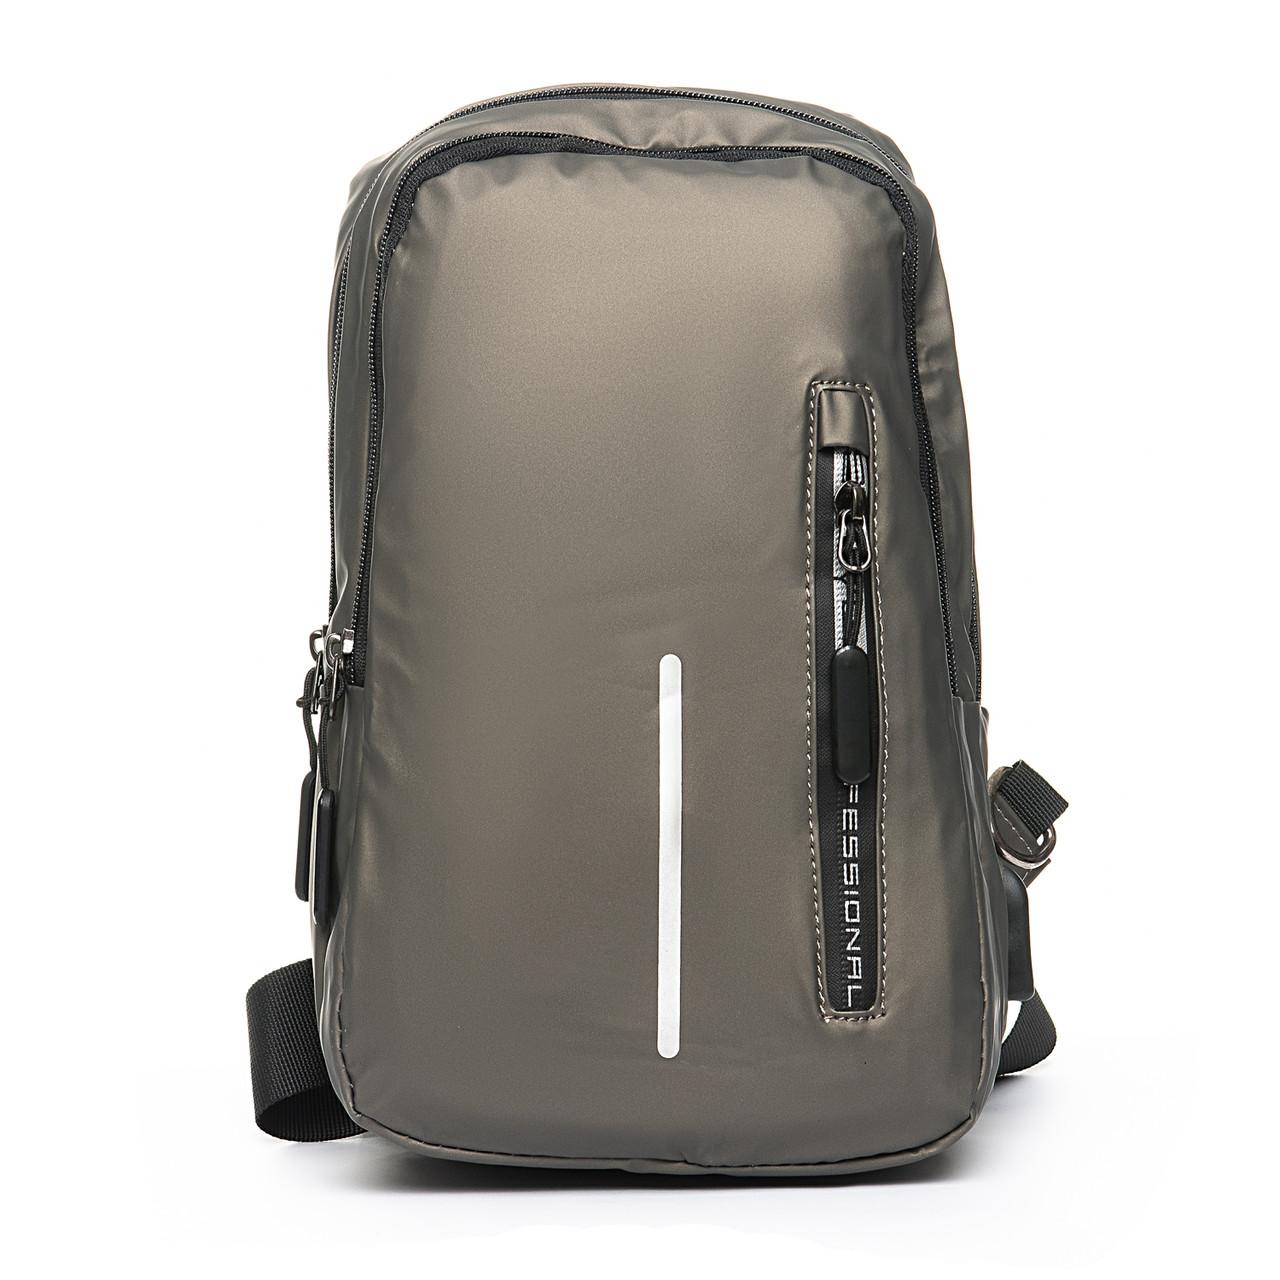 Мужская сумка через плече Lanpad 18 x 30 x 10 см Золотой (6281/4)